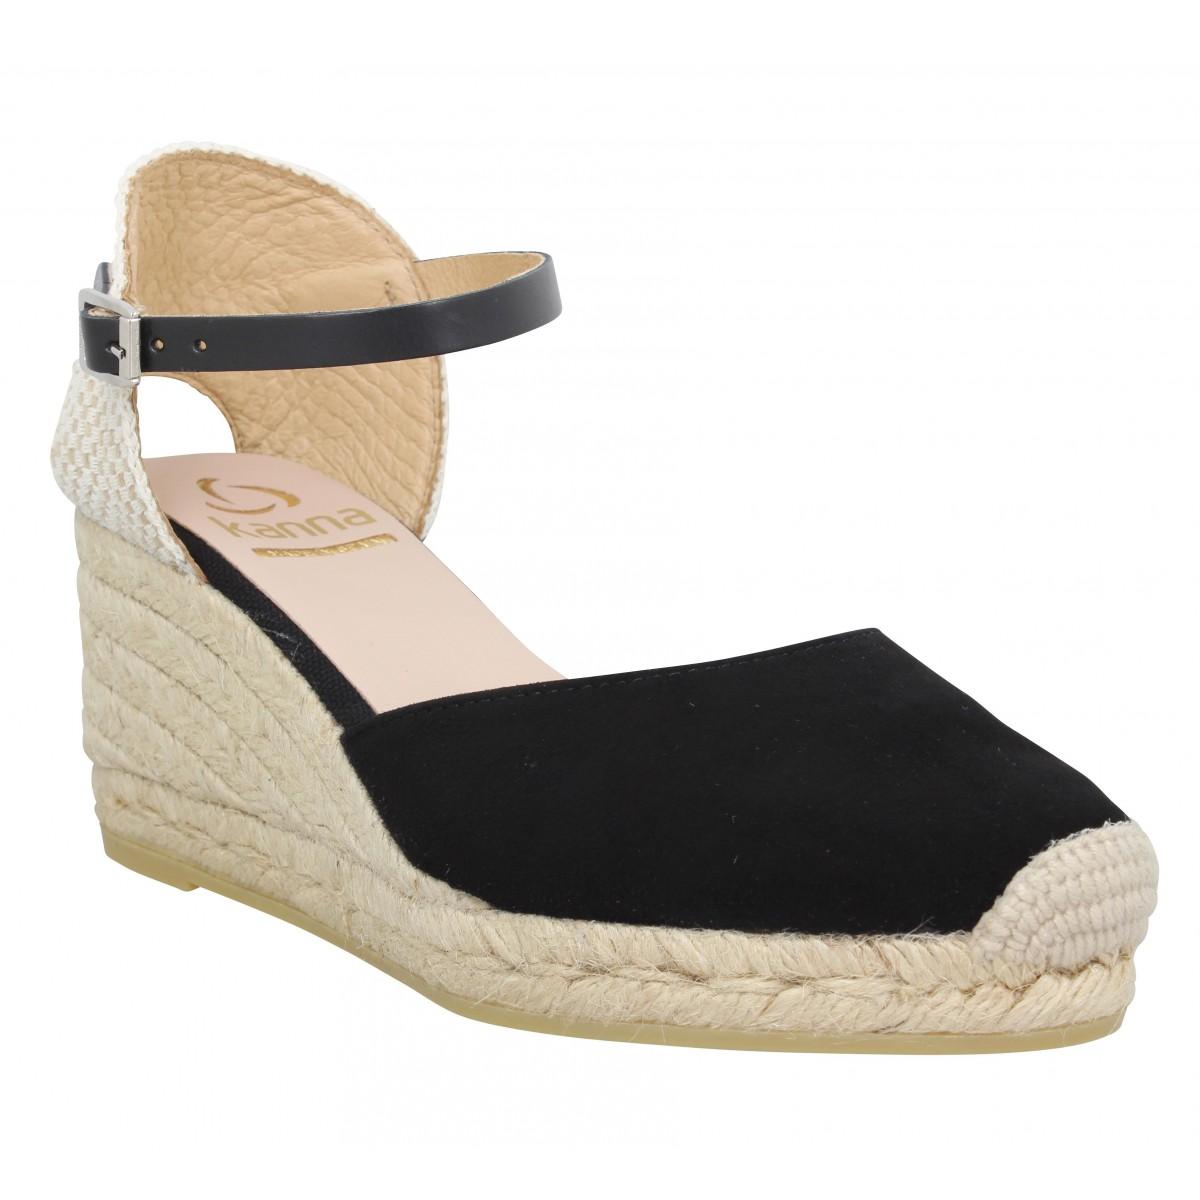 Sandales talons KANNA 9211 velours Femme Noir